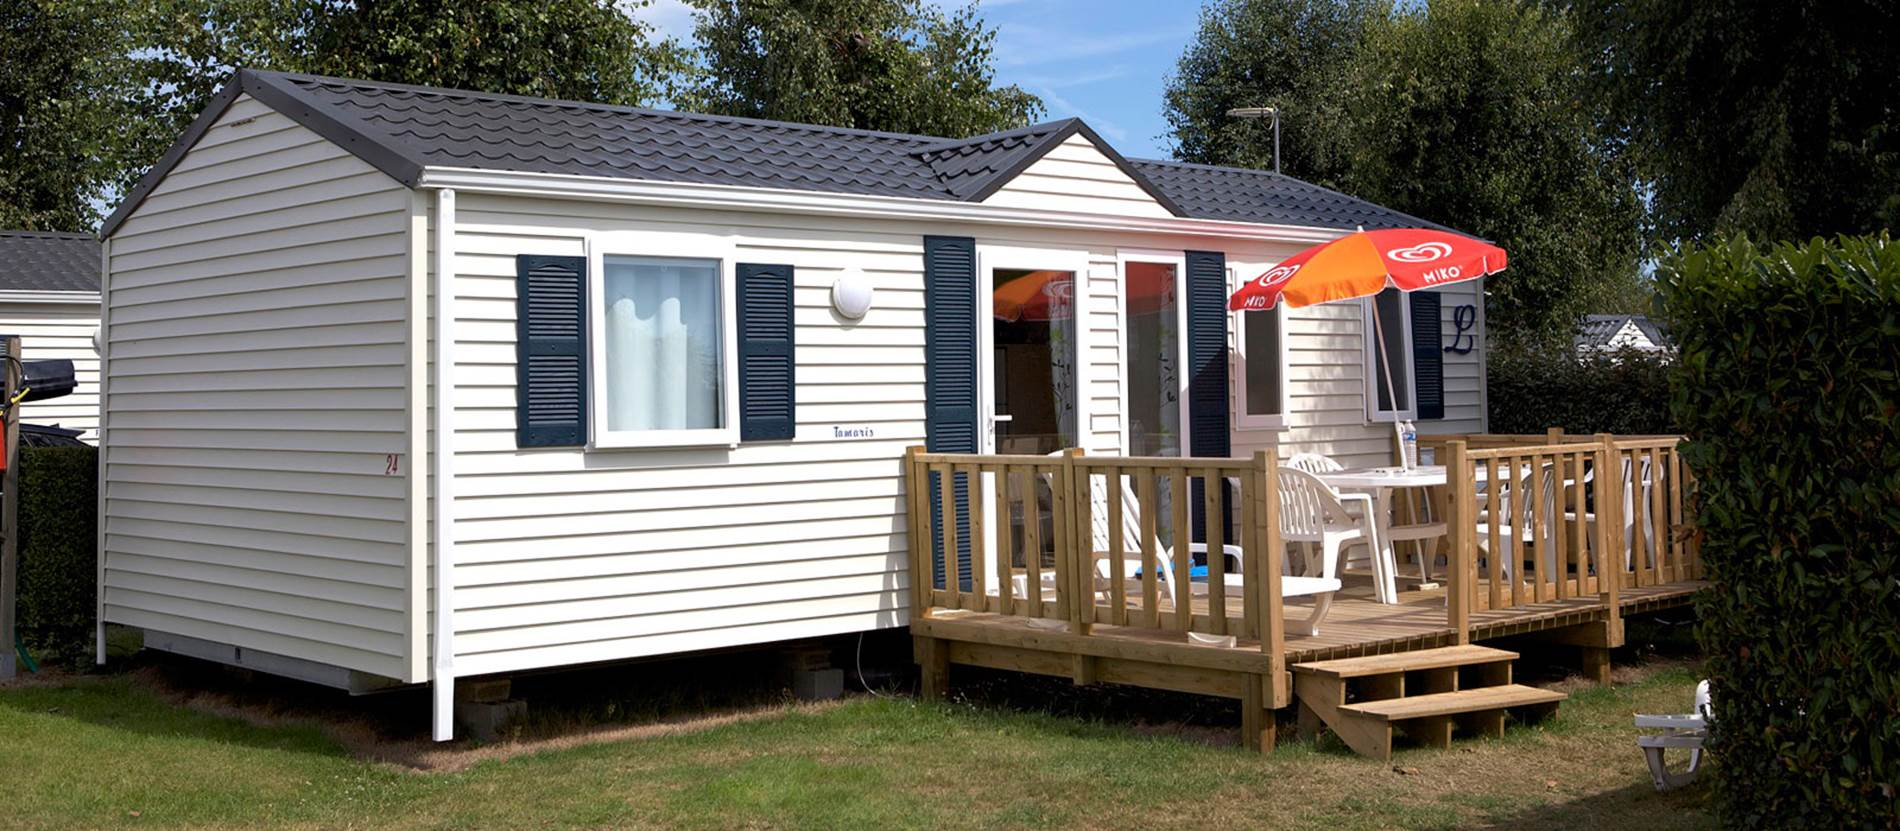 Camping-Kervilor-La-Trinite-sur-Mer-Morbihan-Bretagne-Sud © Camping-Kervilor-La-Trinite-sur-Mer